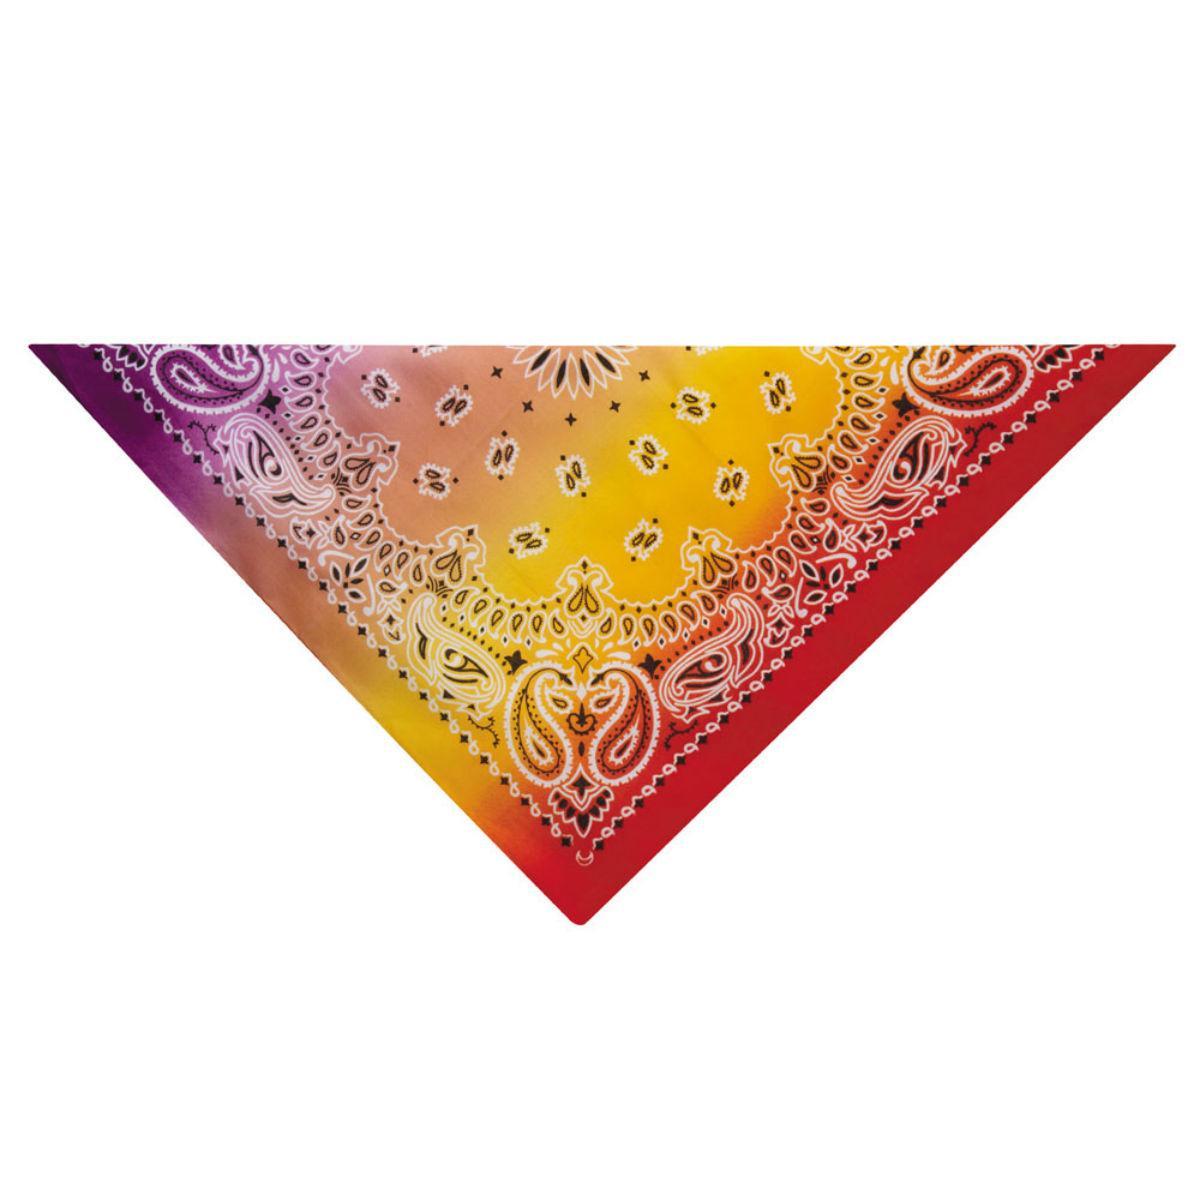 Aria Classic Paisley Dog Bandana - Purple/Red